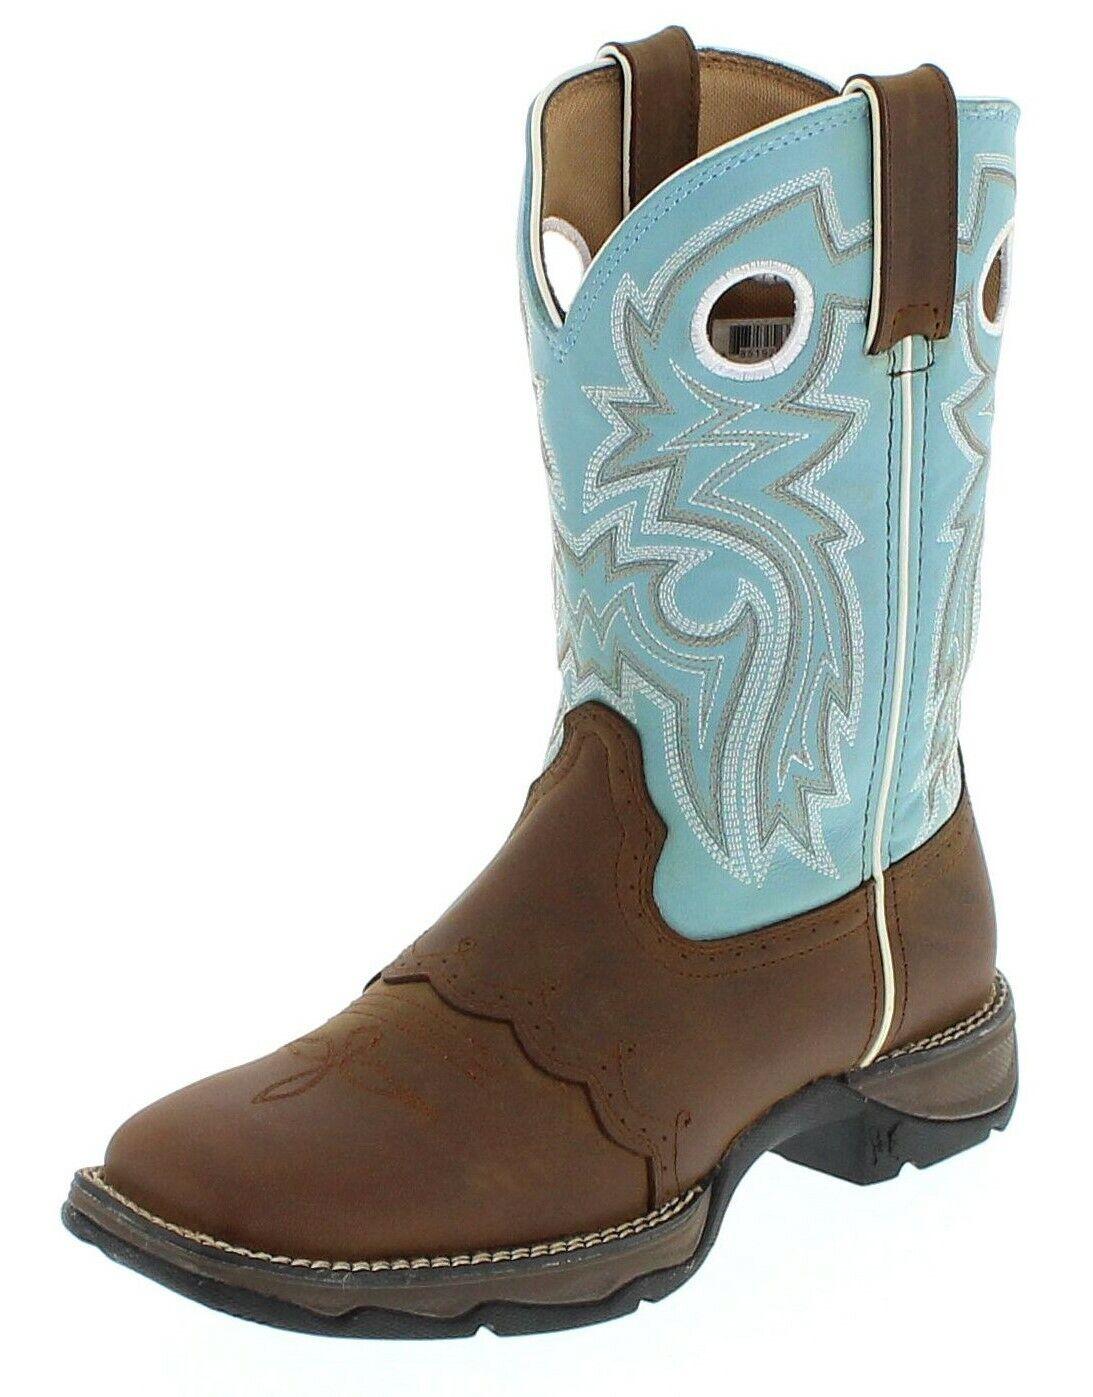 Durango botas botas rd3471 marrón turquesa westernreitbotas work botas